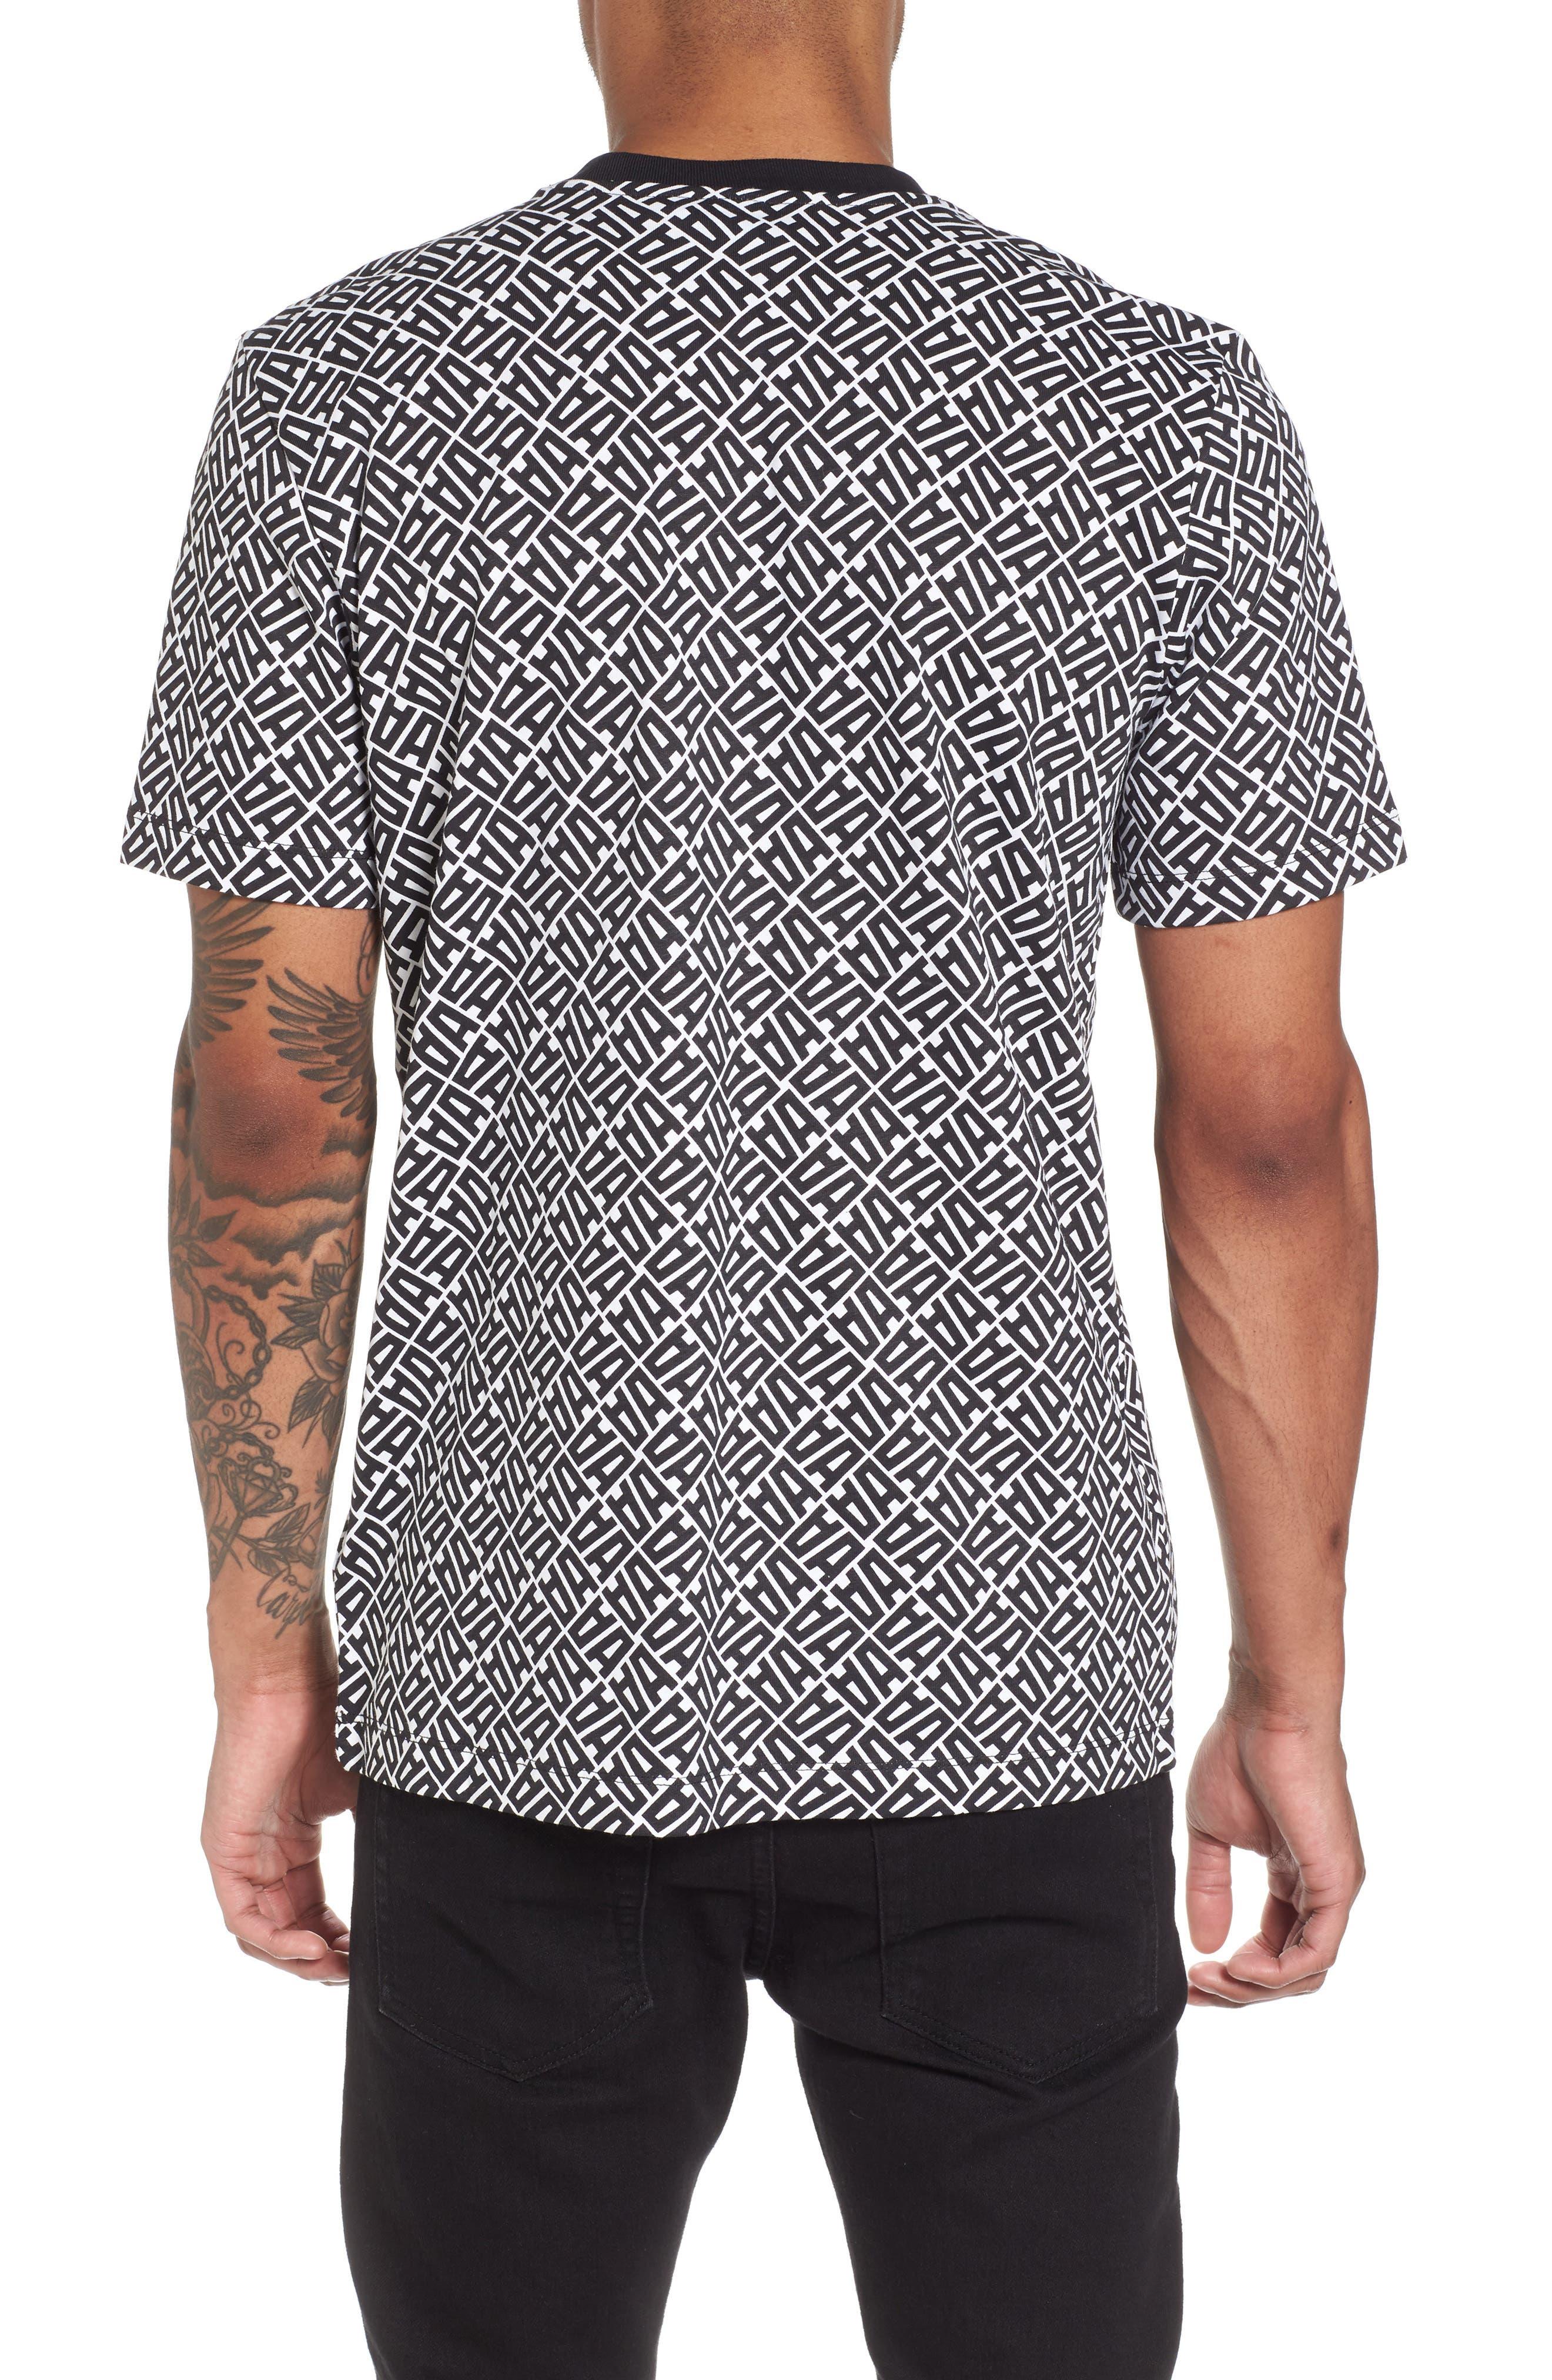 Originals Anichkov T-Shirt,                             Alternate thumbnail 2, color,                             001